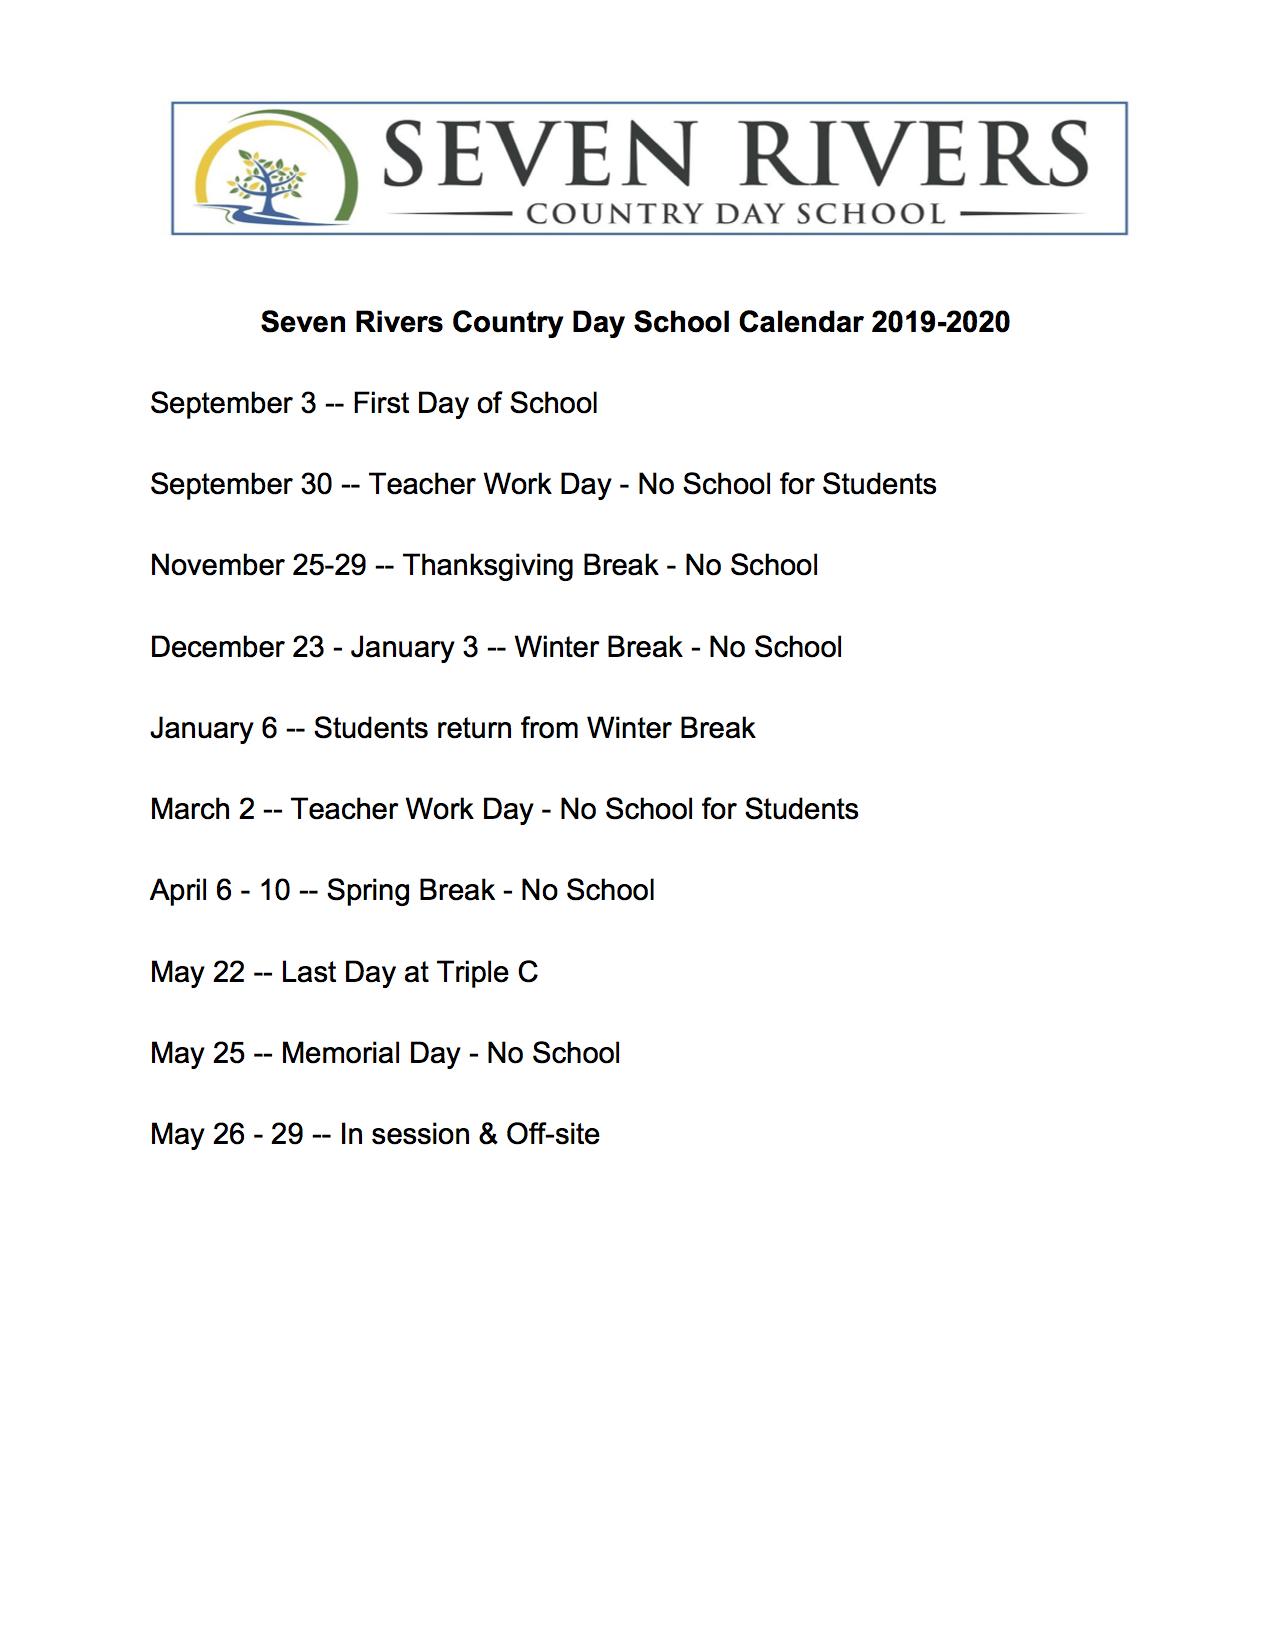 Seven Rivers Country Day School Calendar 2019-2020.jpg